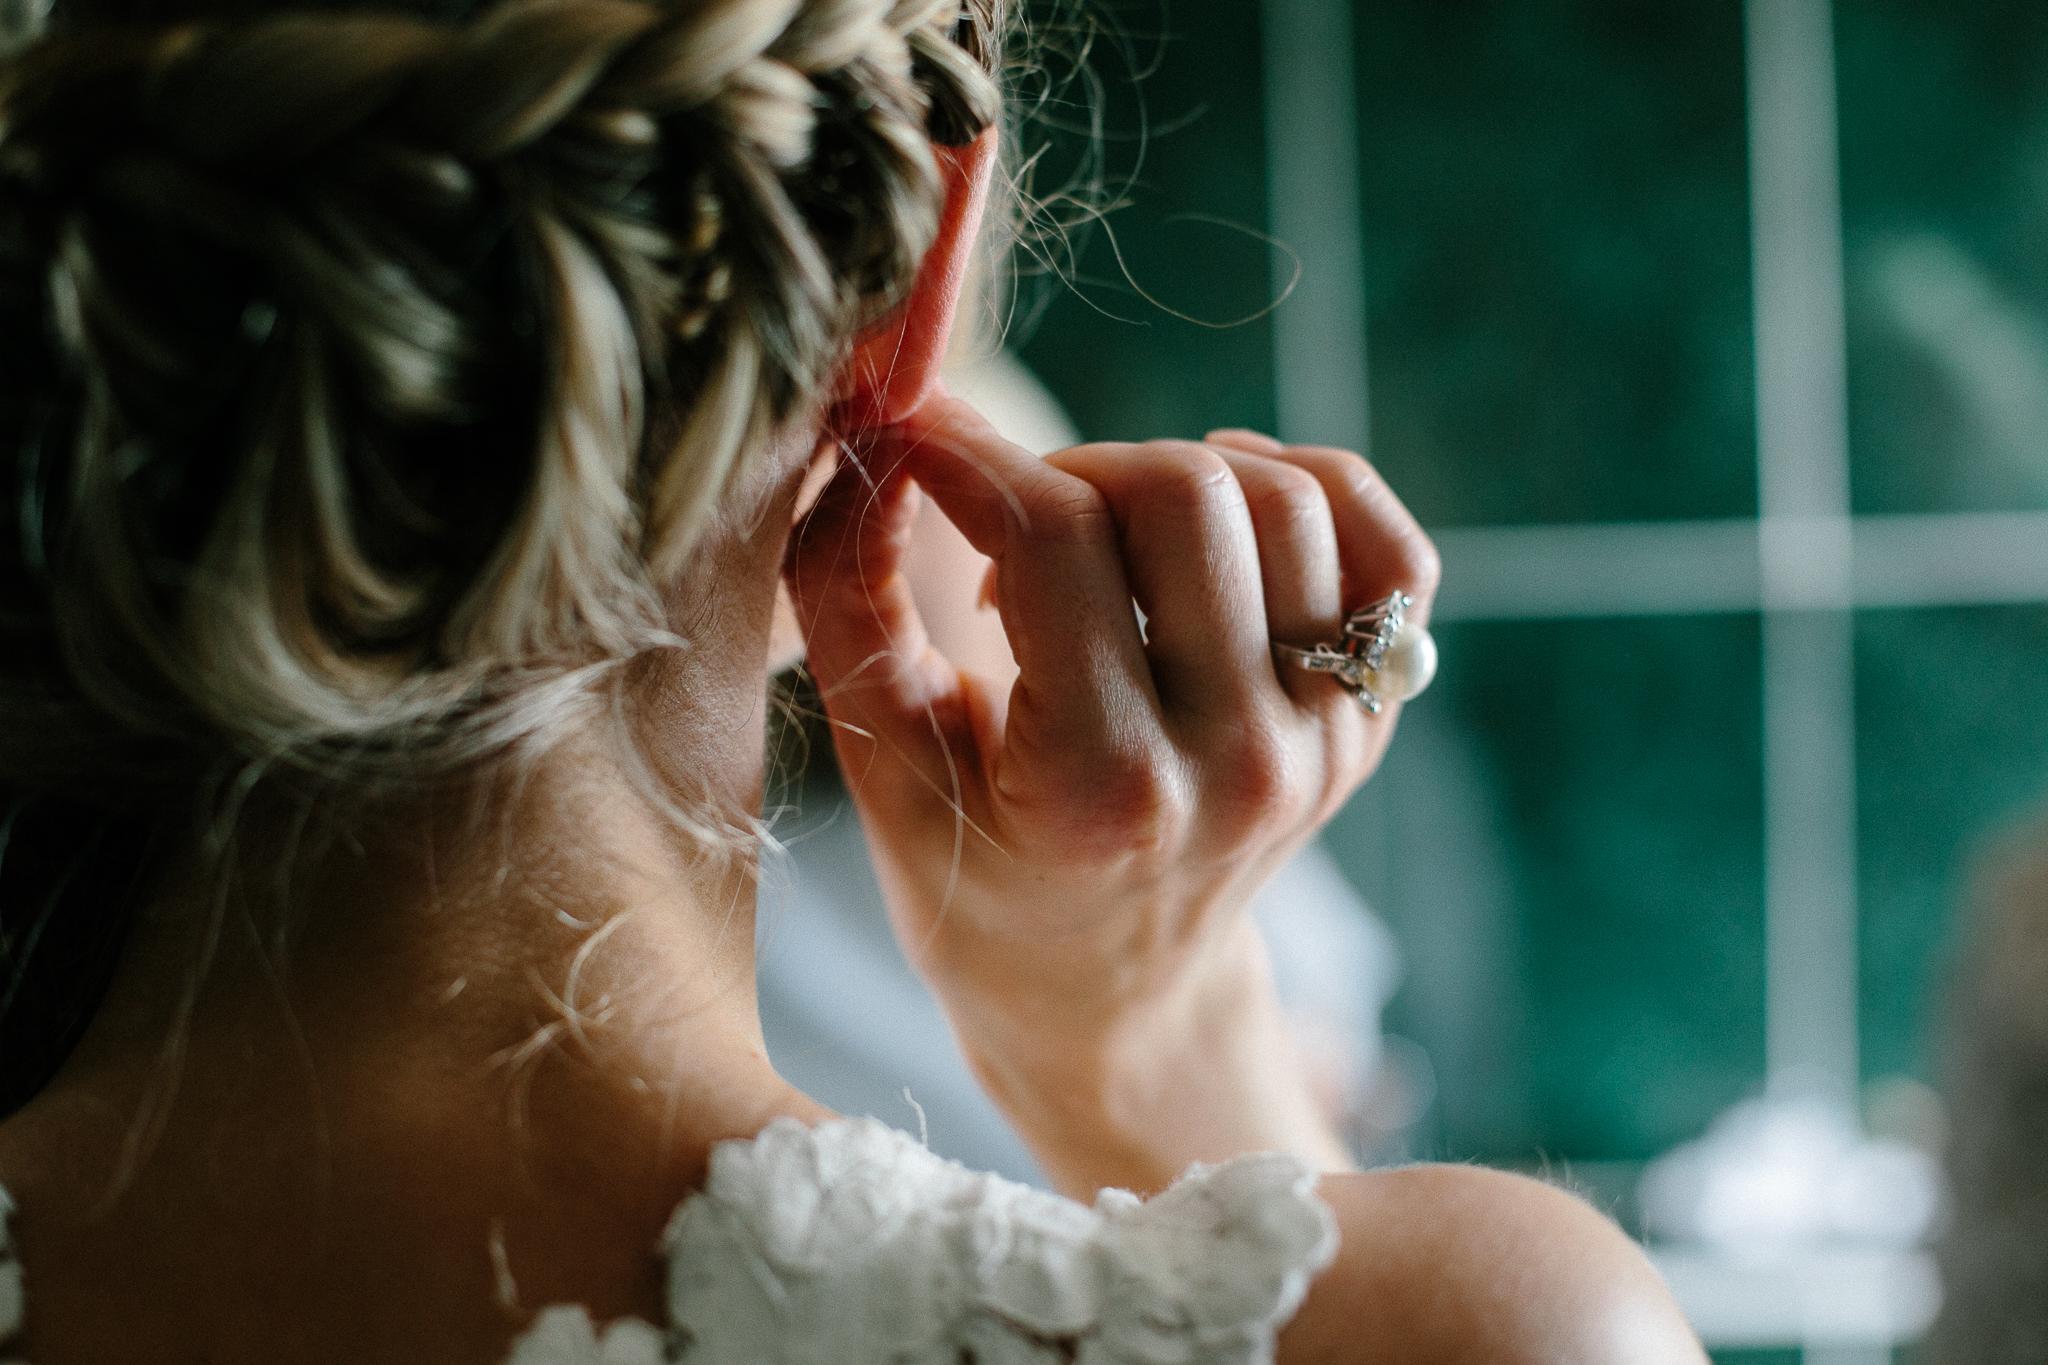 grantham_wedding_photographer-39.jpg